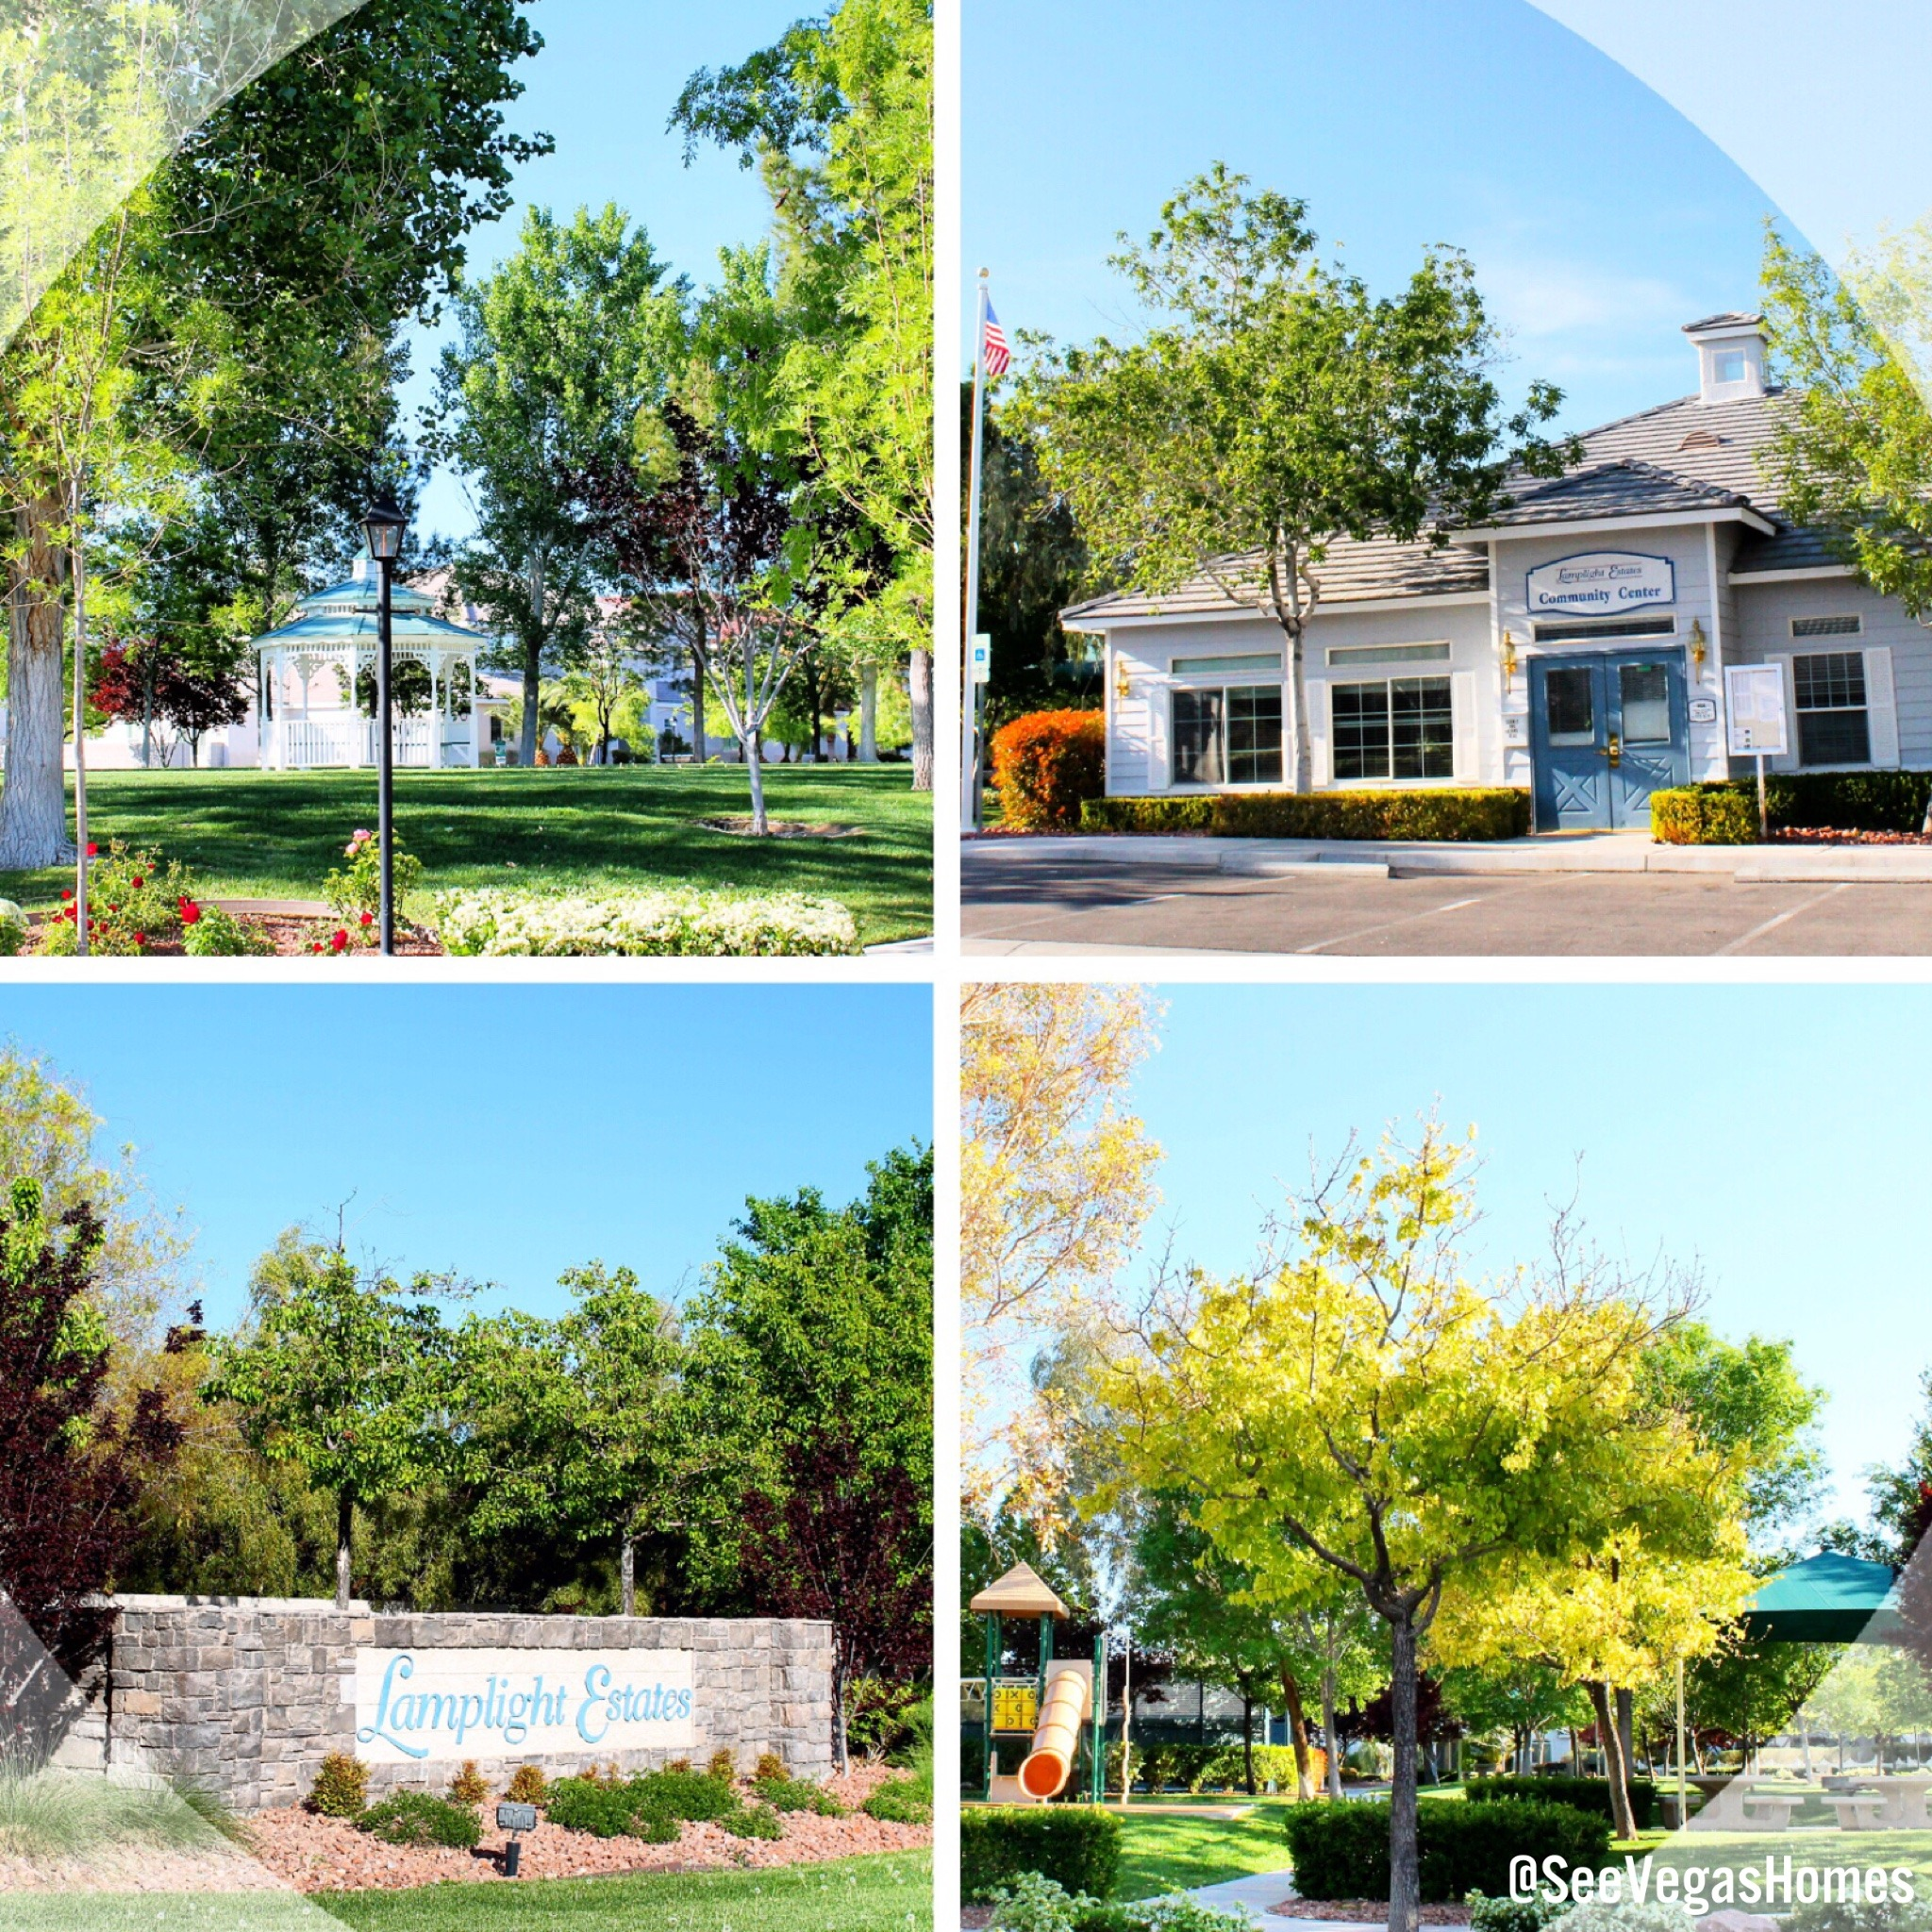 Lamplight Estates 89131 Homes For Sale